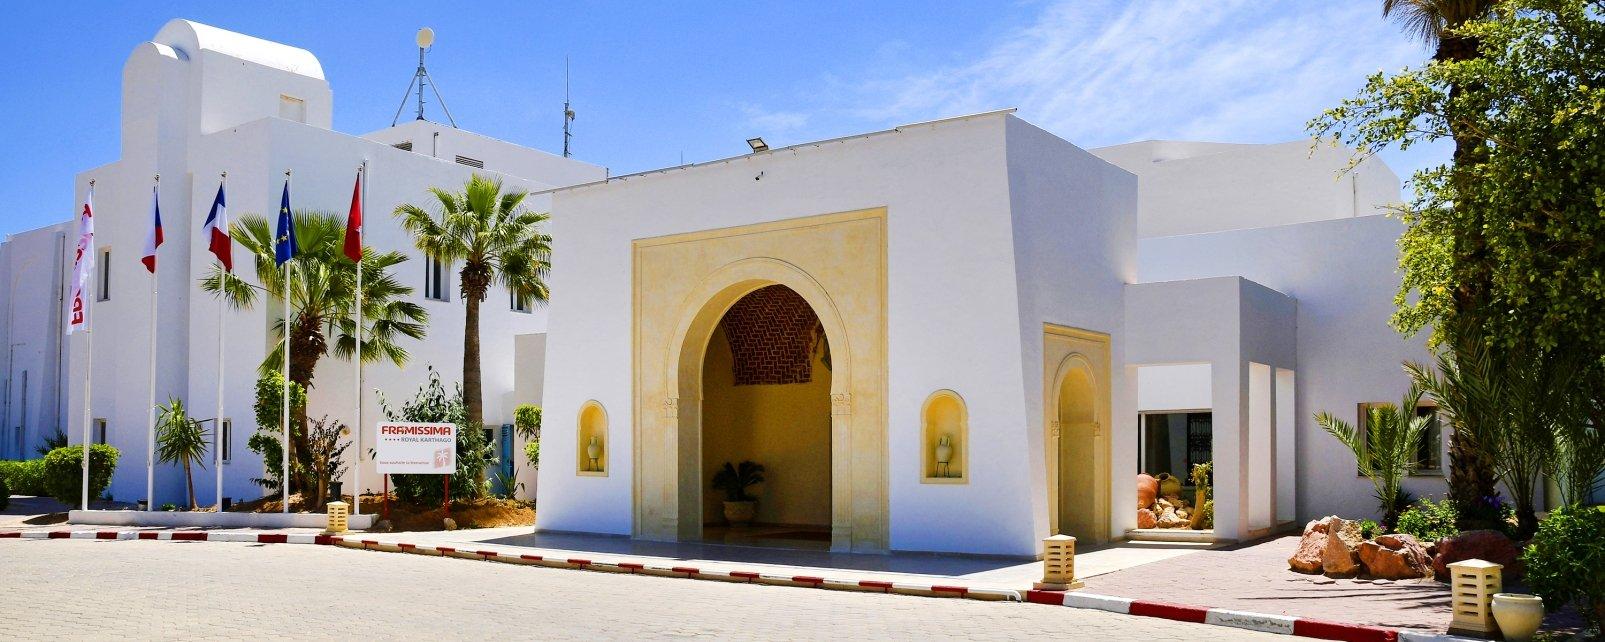 Framissima Royal Karthago Djerba & Thalasso